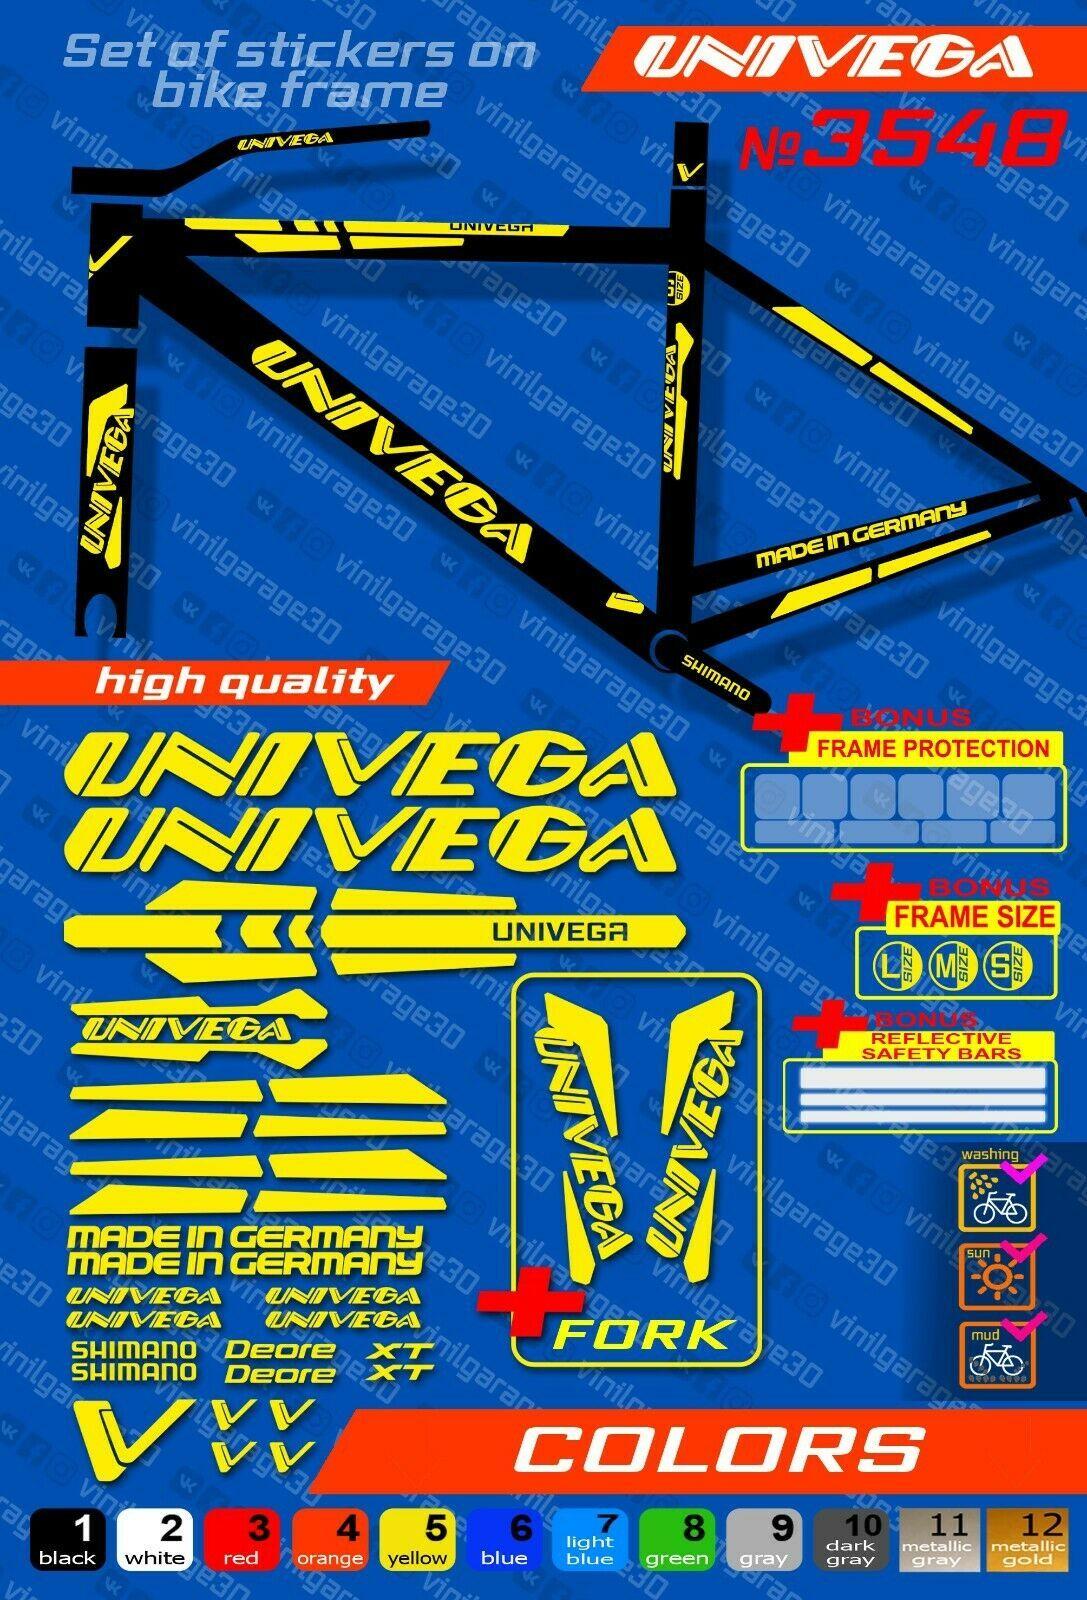 bike frame sticker set fork KTM bike stickers ALL COLORS AVAILABLE